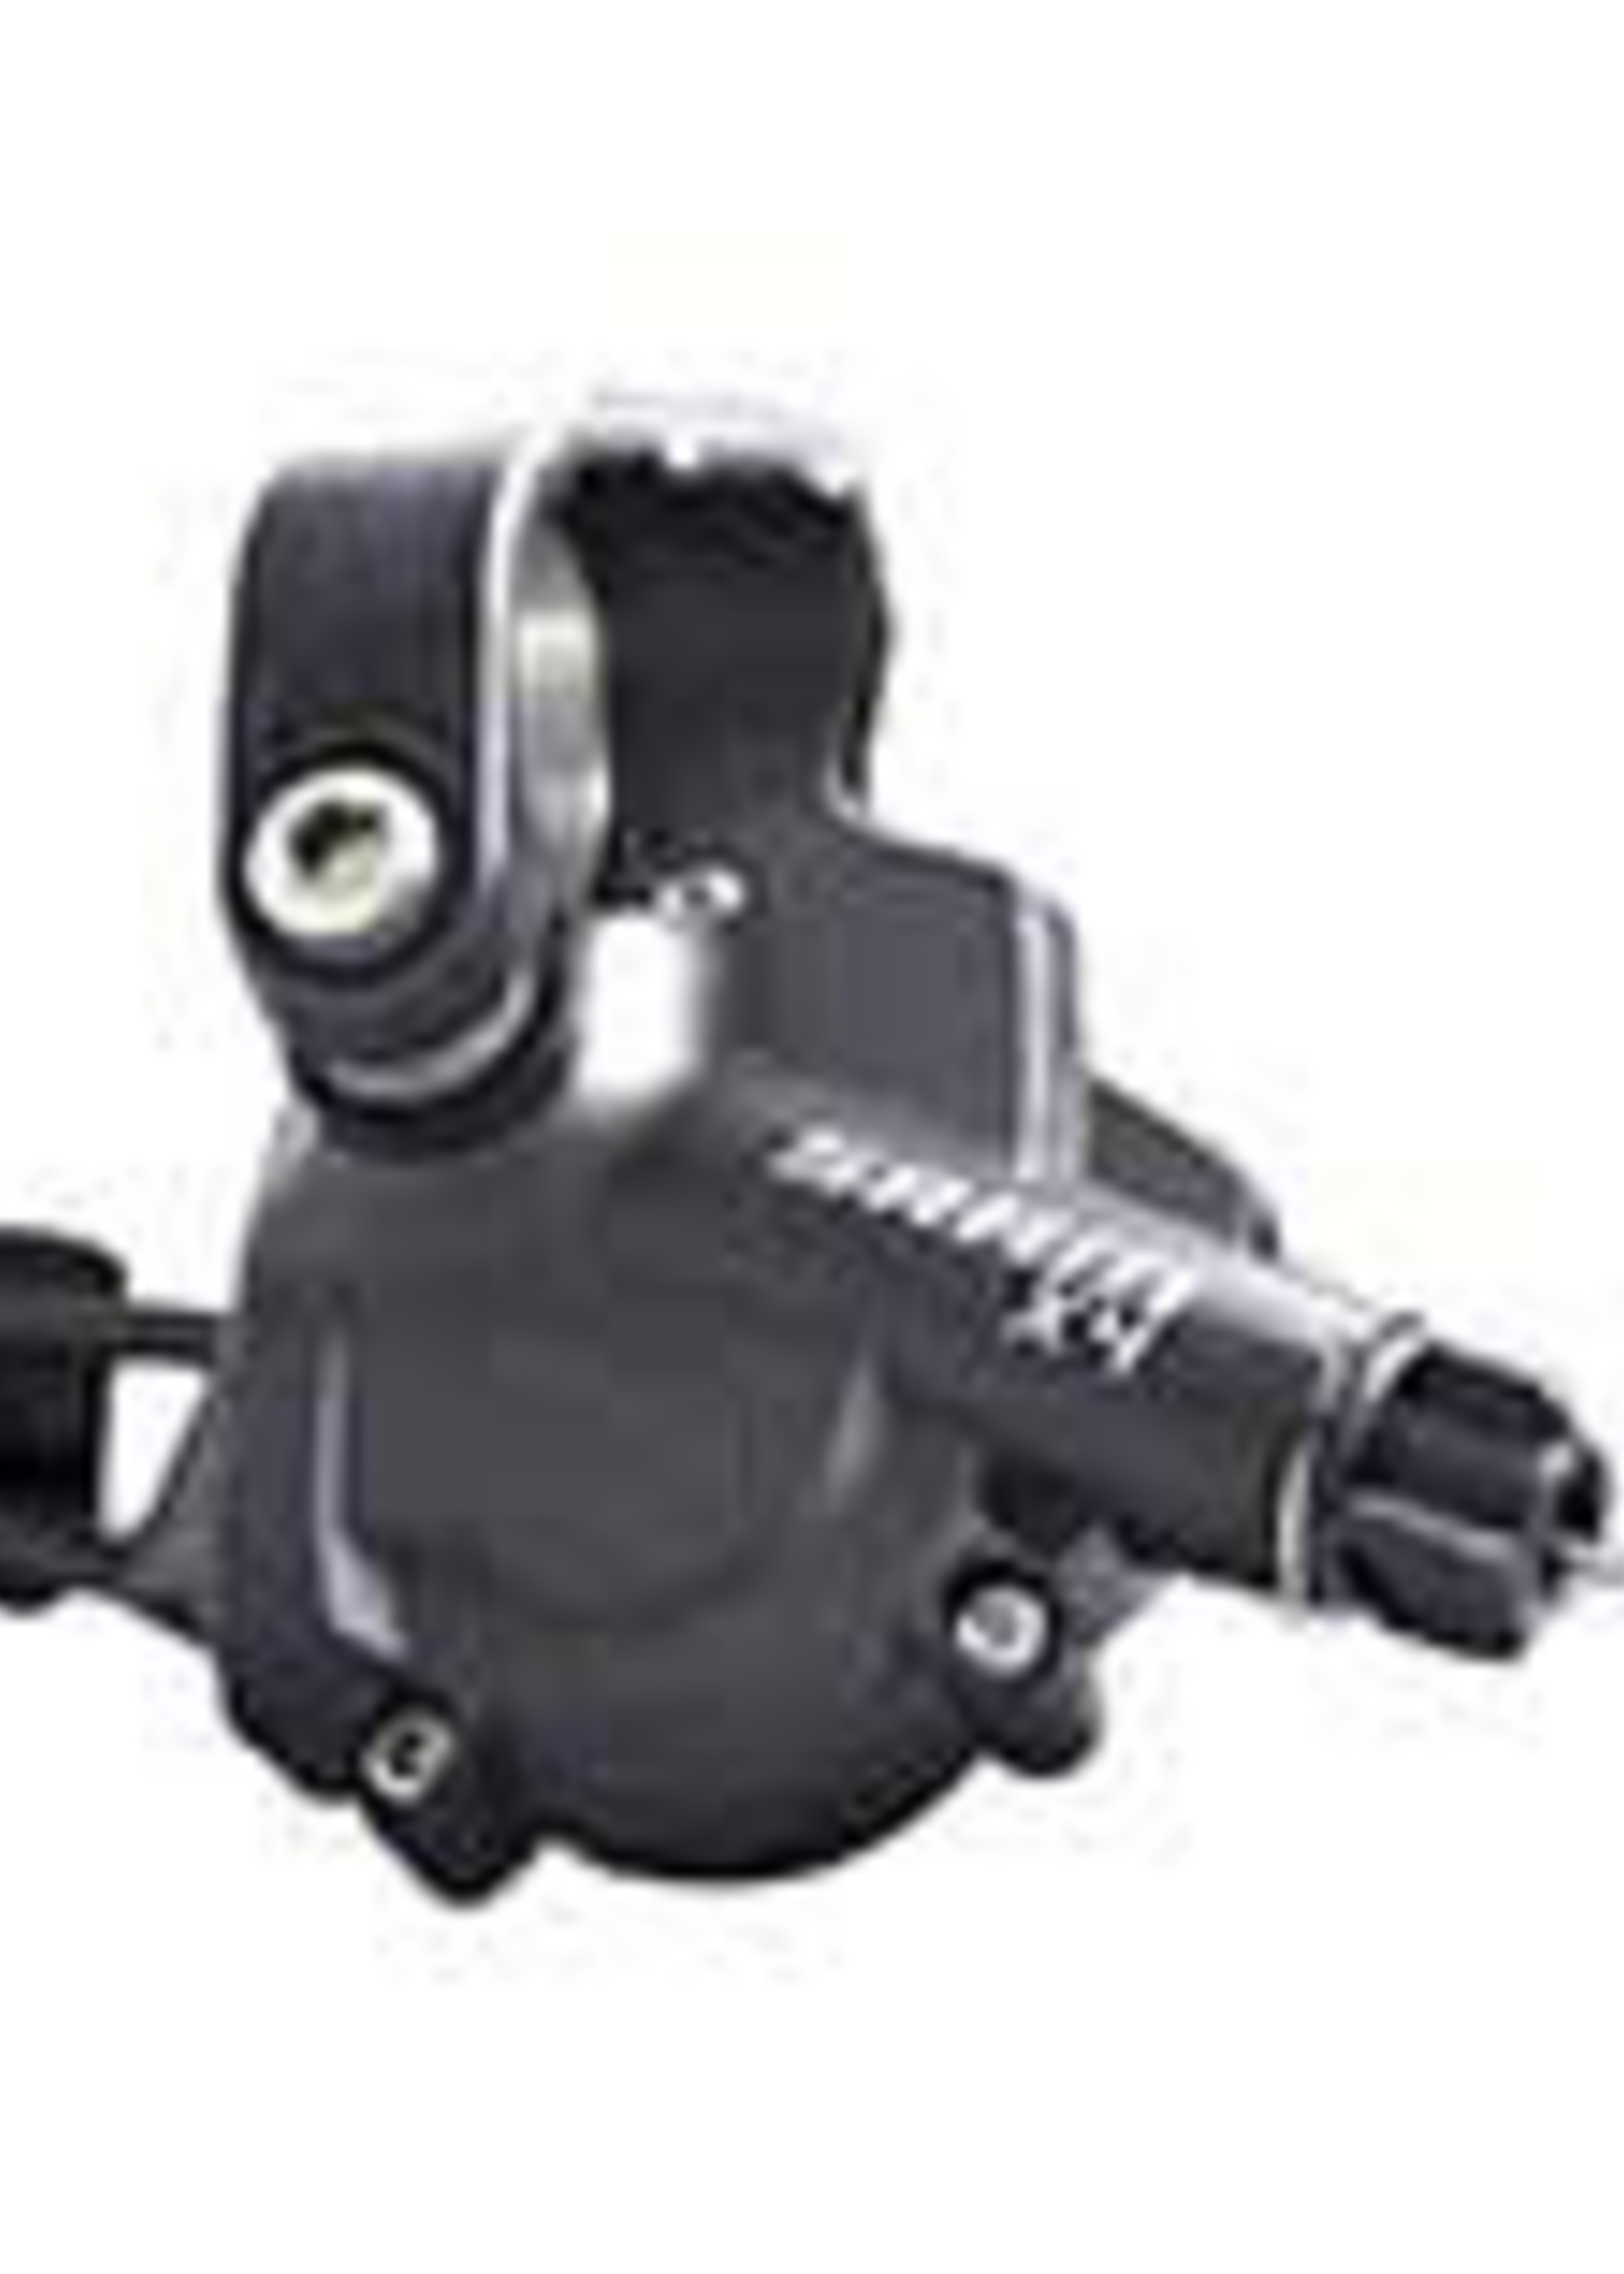 SRAM SRAM X3 3X7 SHIFTER PAIR